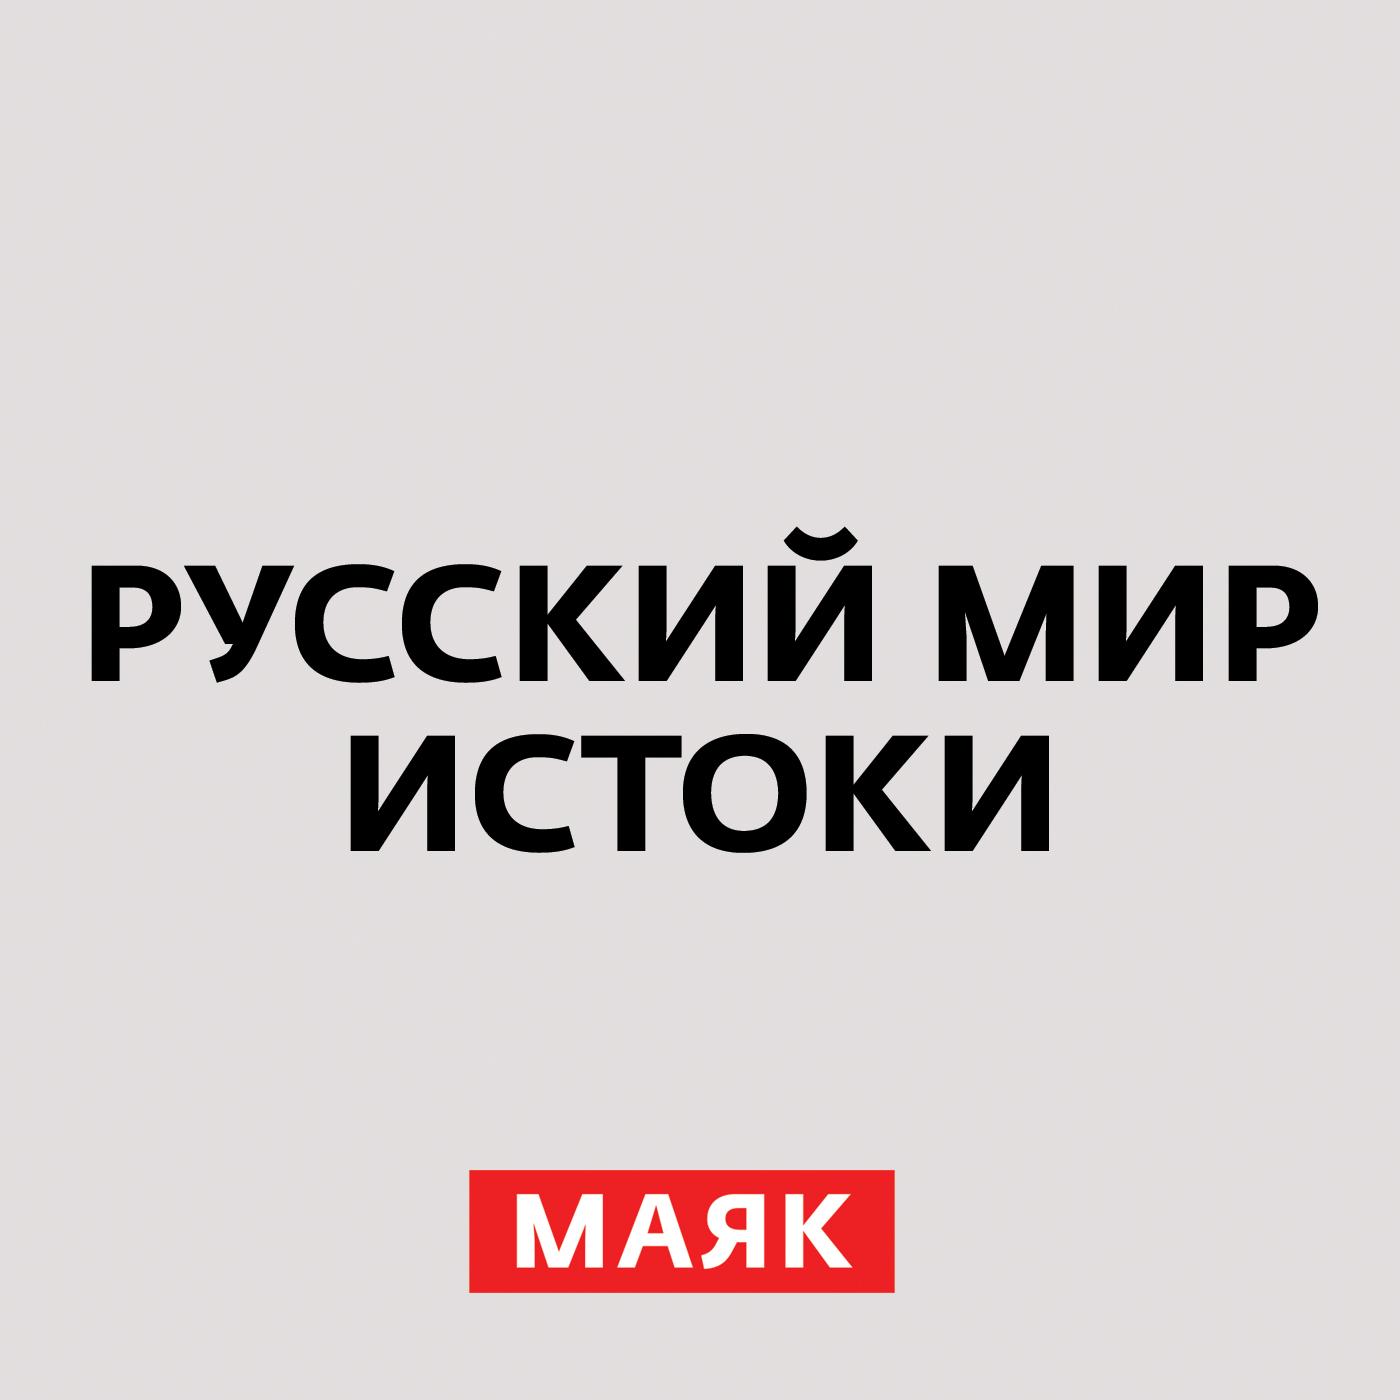 Творческий коллектив радио «Маяк» Ярославичи и Даниил Московский даниил пьясор айсонаку